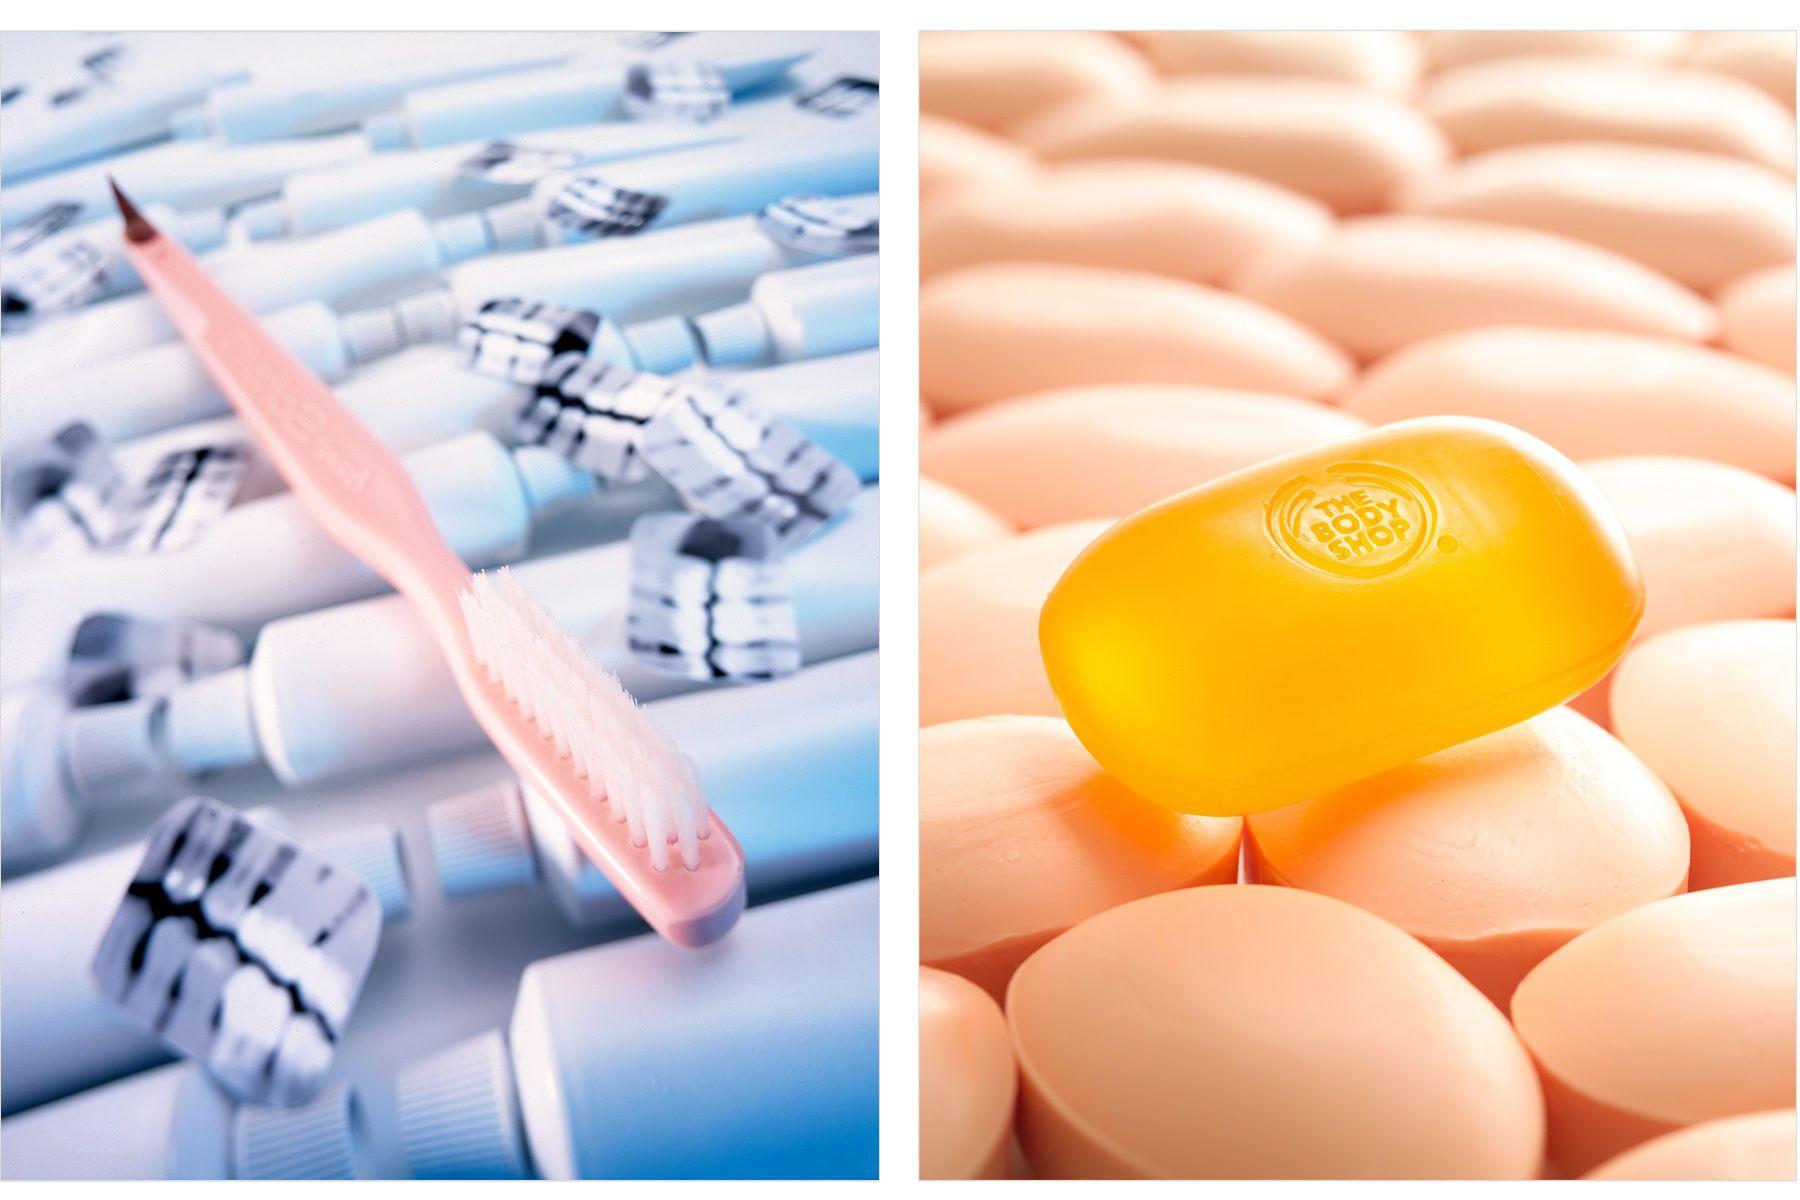 1toothbrush_soap.jpg